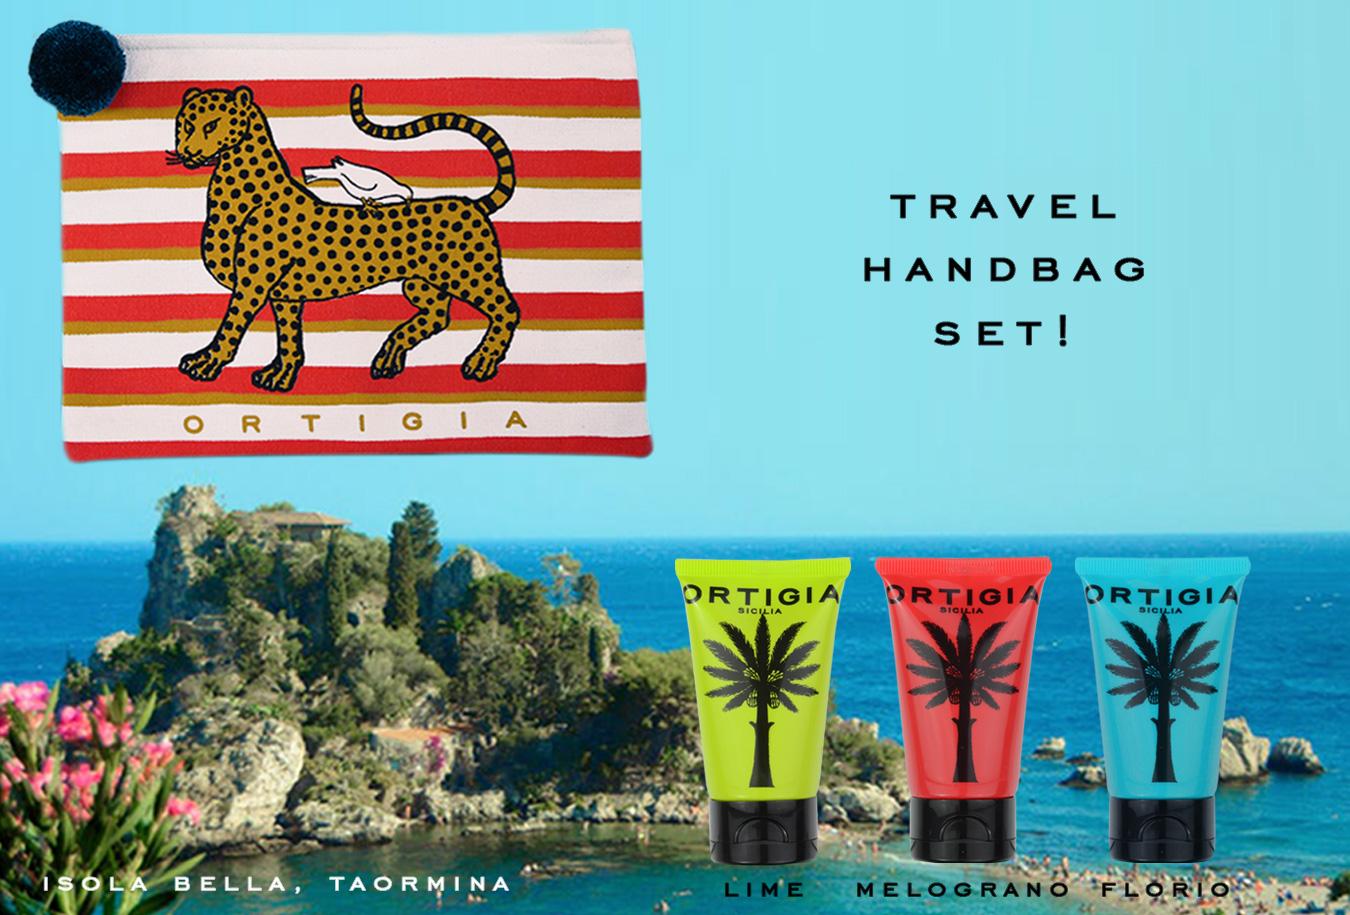 Travel Handbag Set